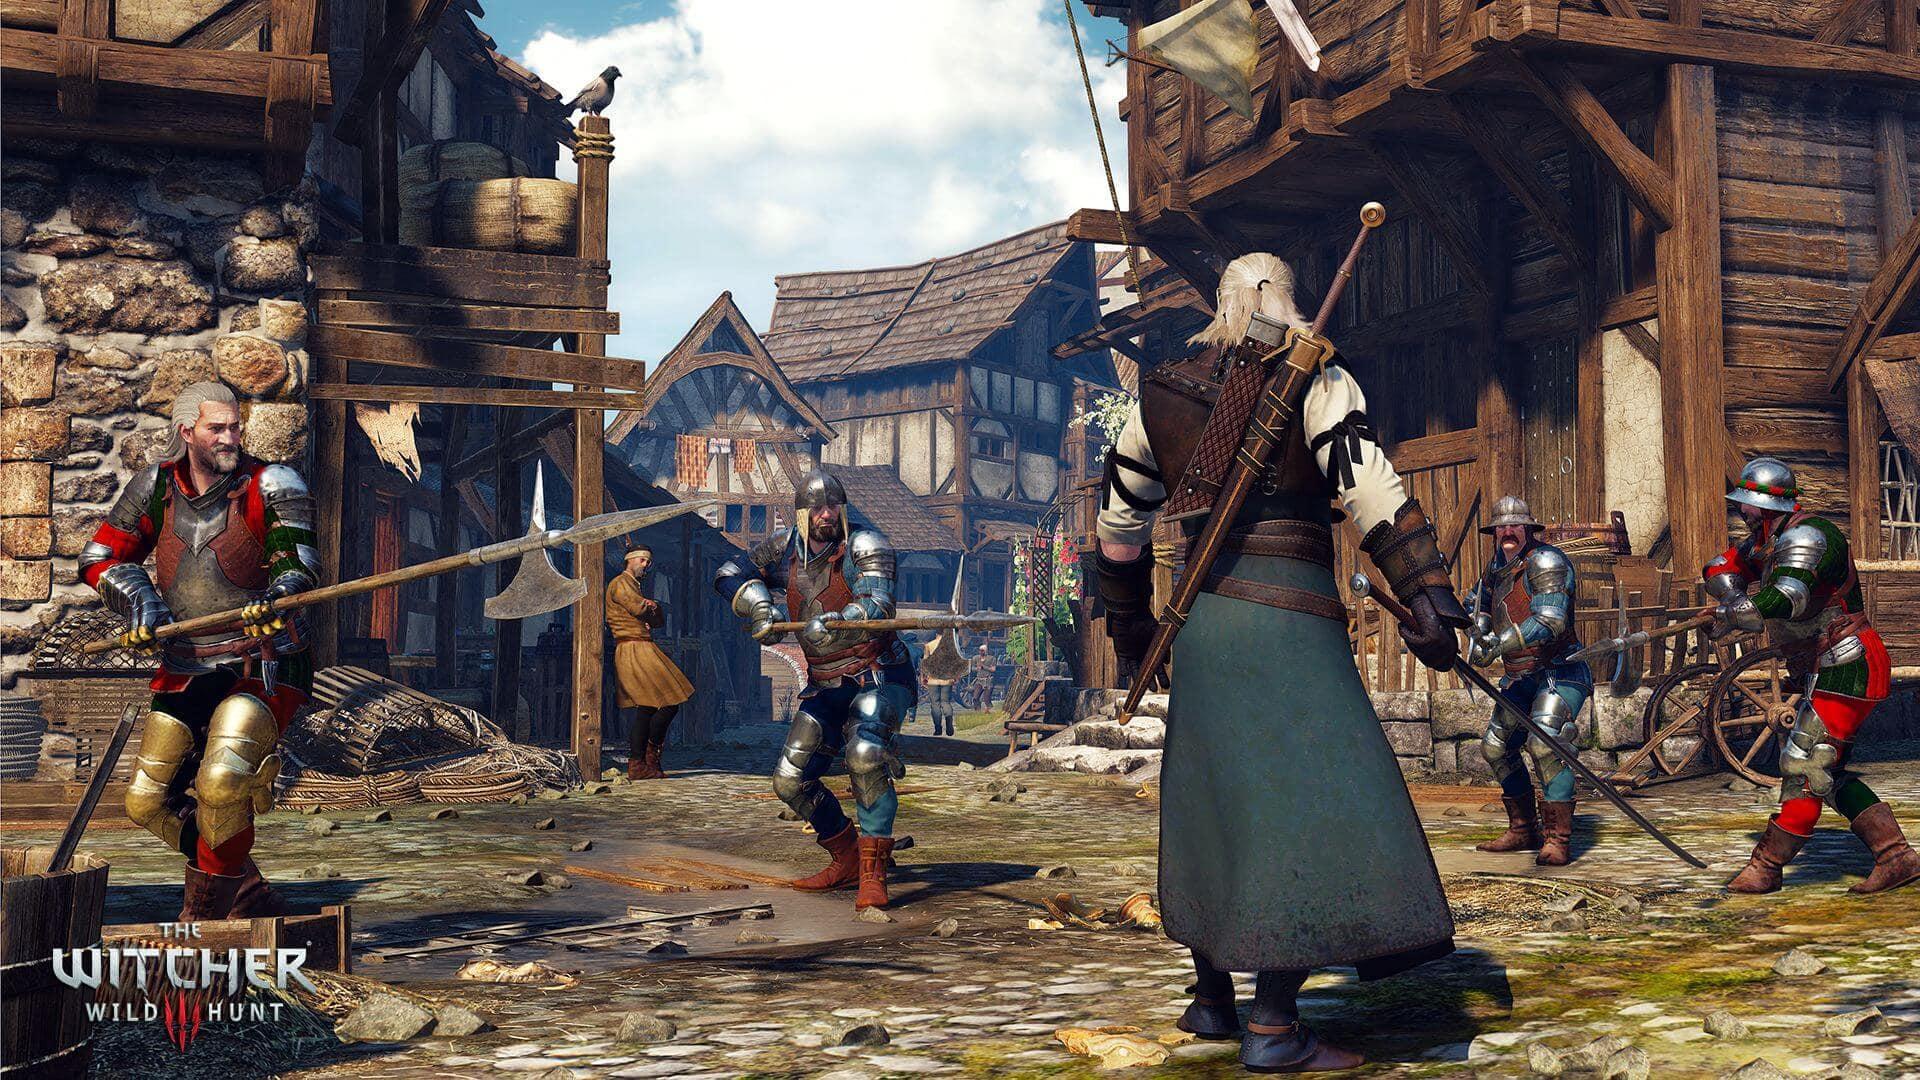 The Witcher 3: Wild Hunt Geralt vs Guards Screenshot